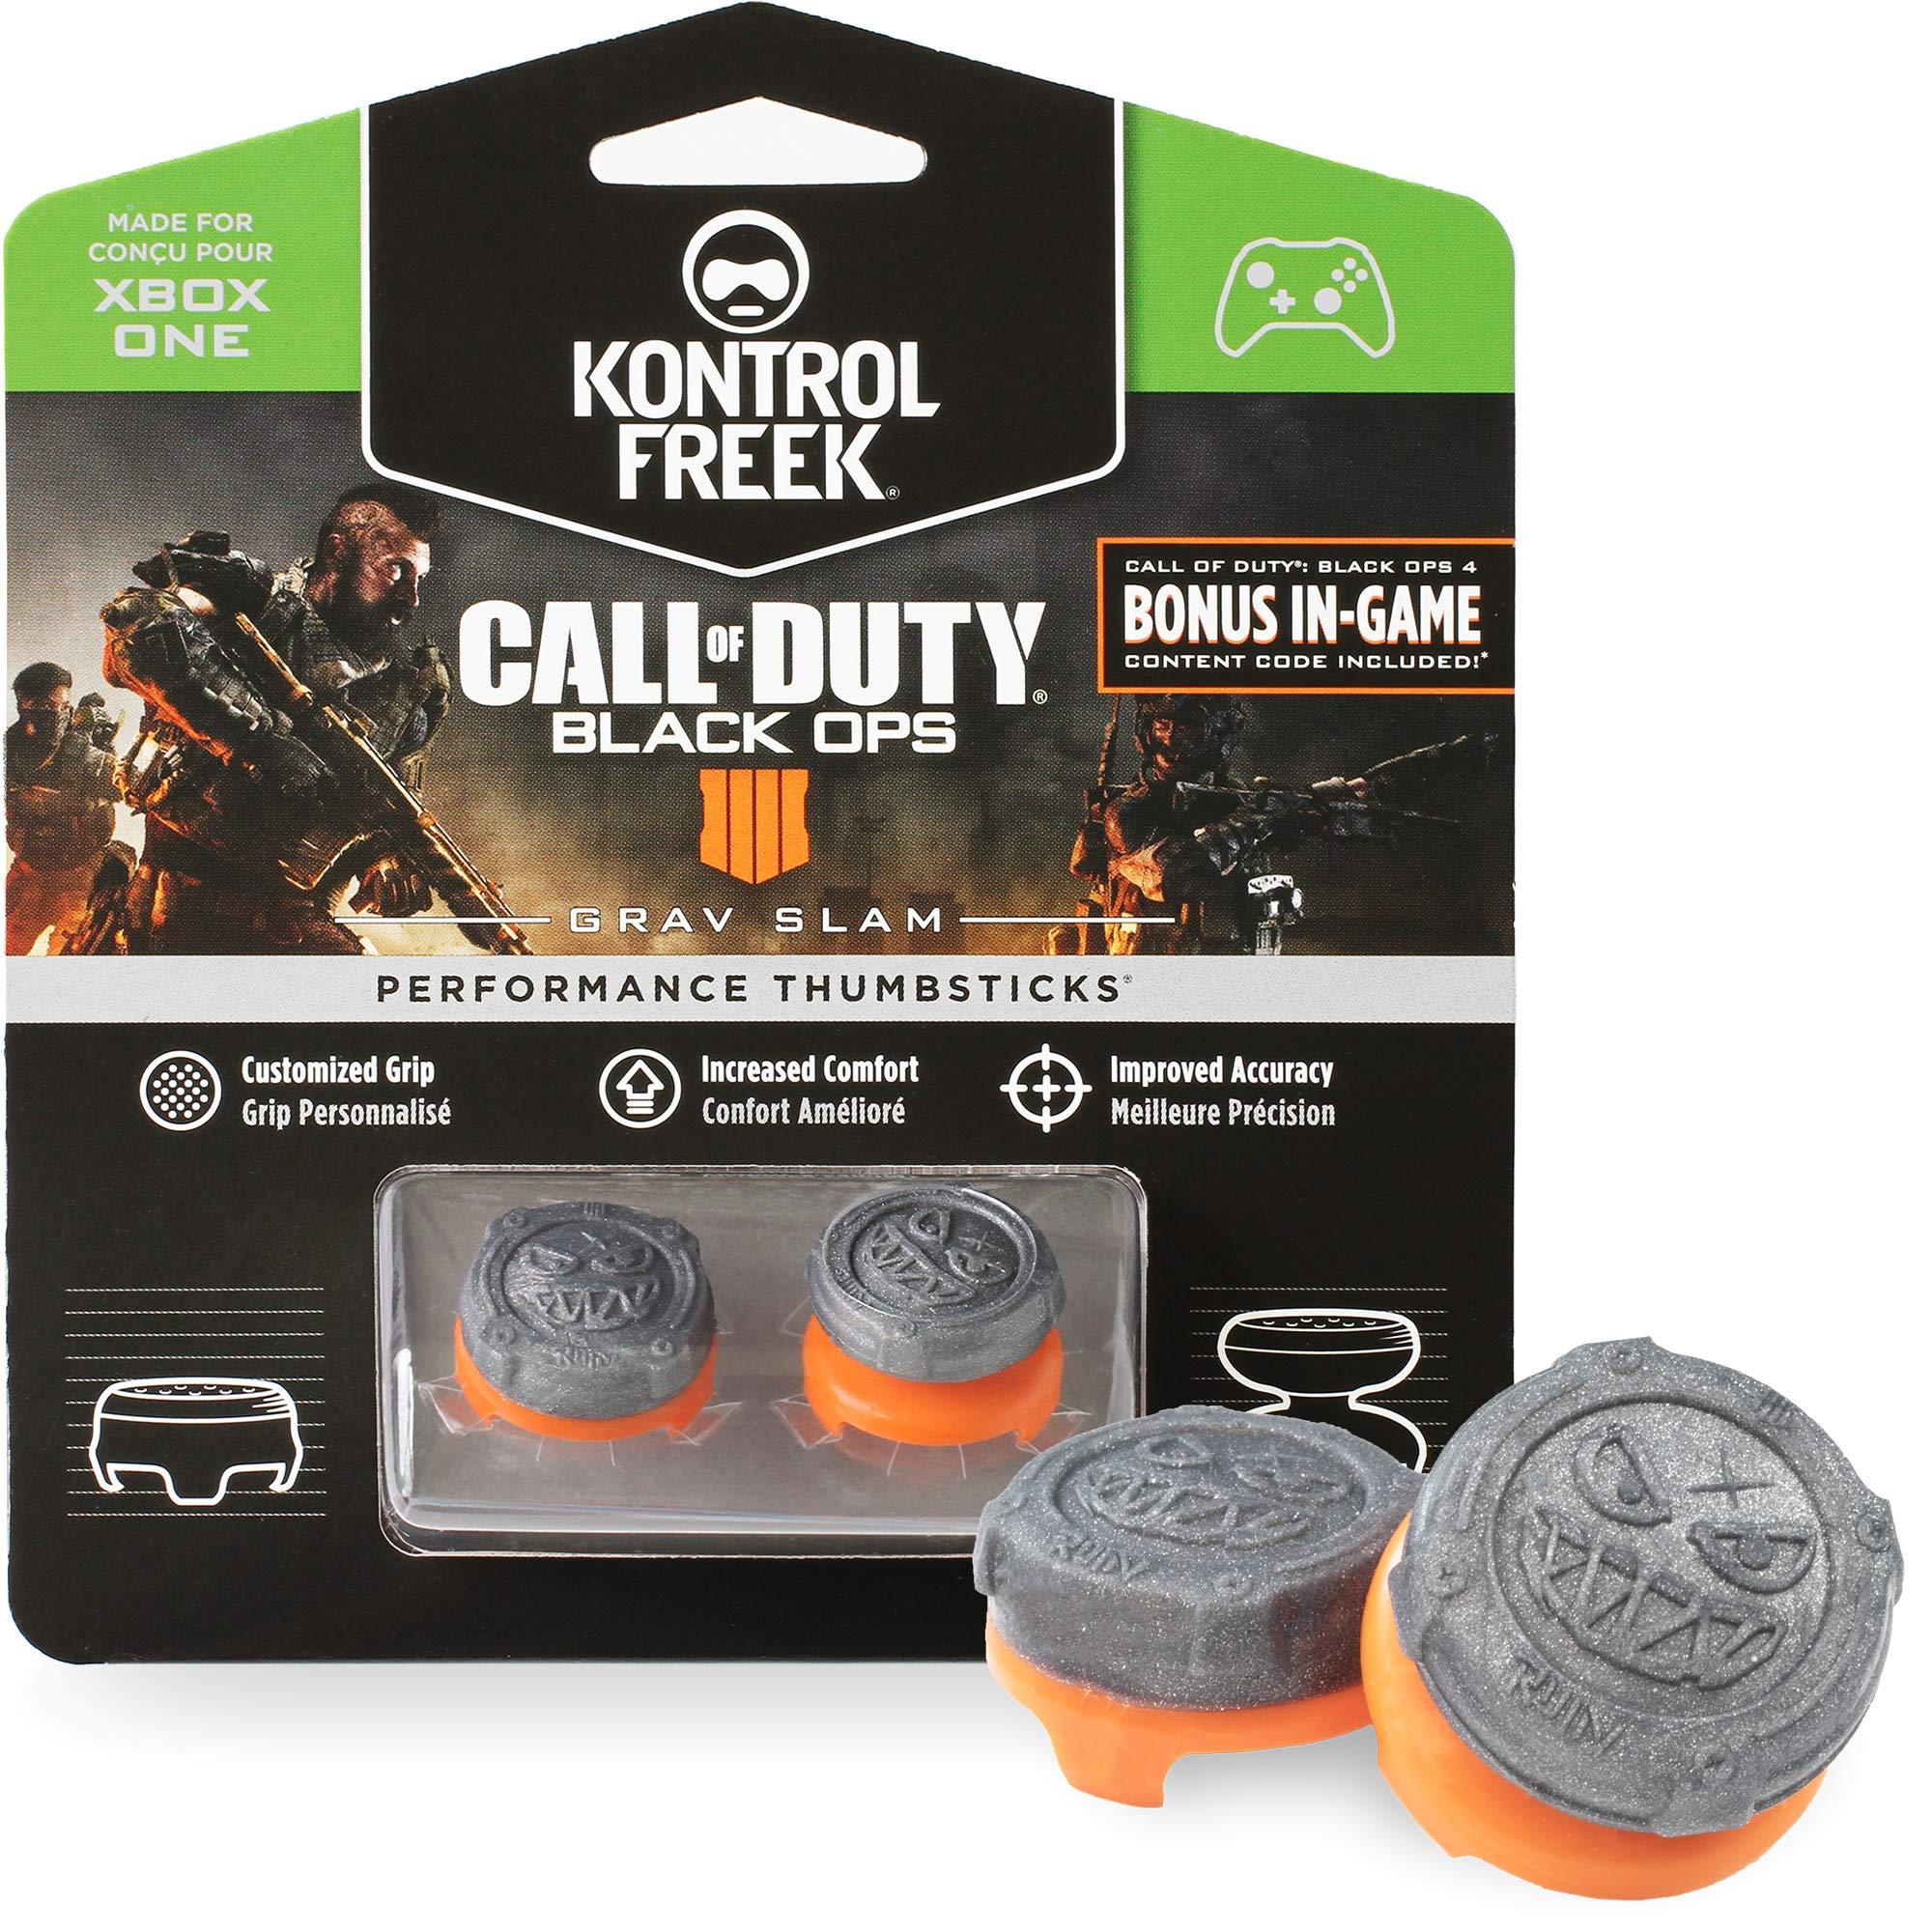 KontrolFreek Call of Duty: Black Ops 4 Grav Slam for Xbox One Controller | Performance Thumbsticks | 1 High-Rise Convex, 1 Mid-Rise Convex | Gray/Orange by KontrolFreek